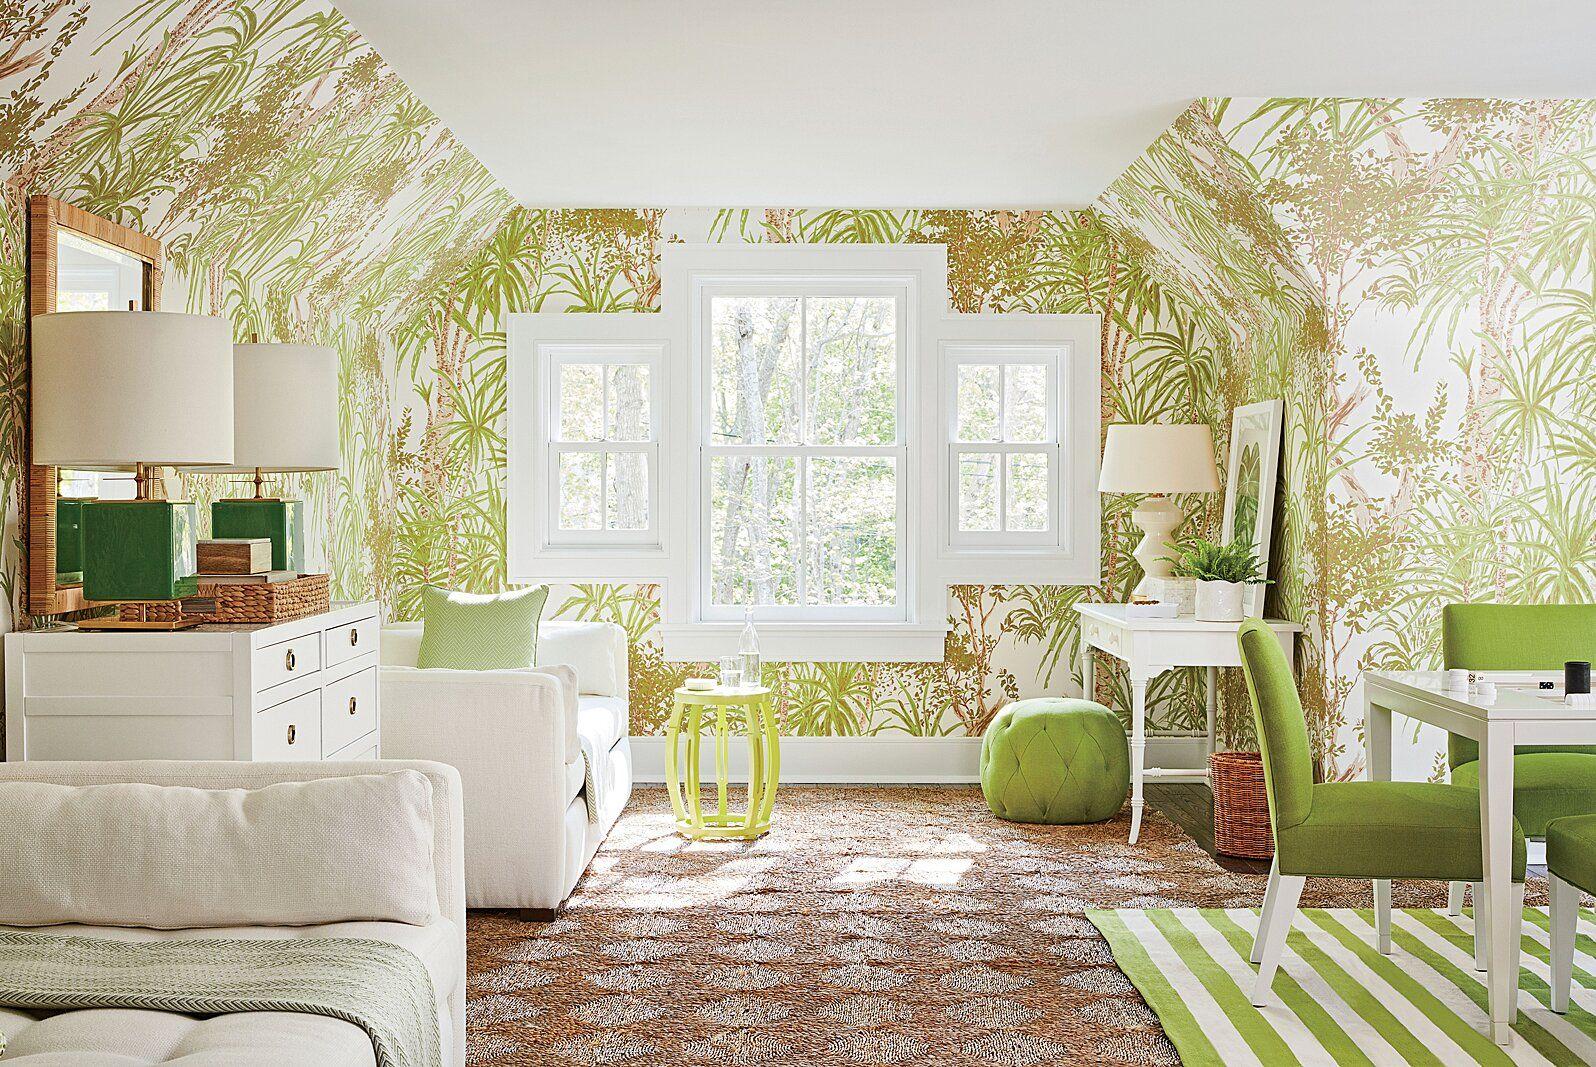 The Hottest Pinterest Home Design Trends Of 2017 In 2021 Design Living Room Wallpaper Green Rooms Living Room Designs Wallpaper home decor living room